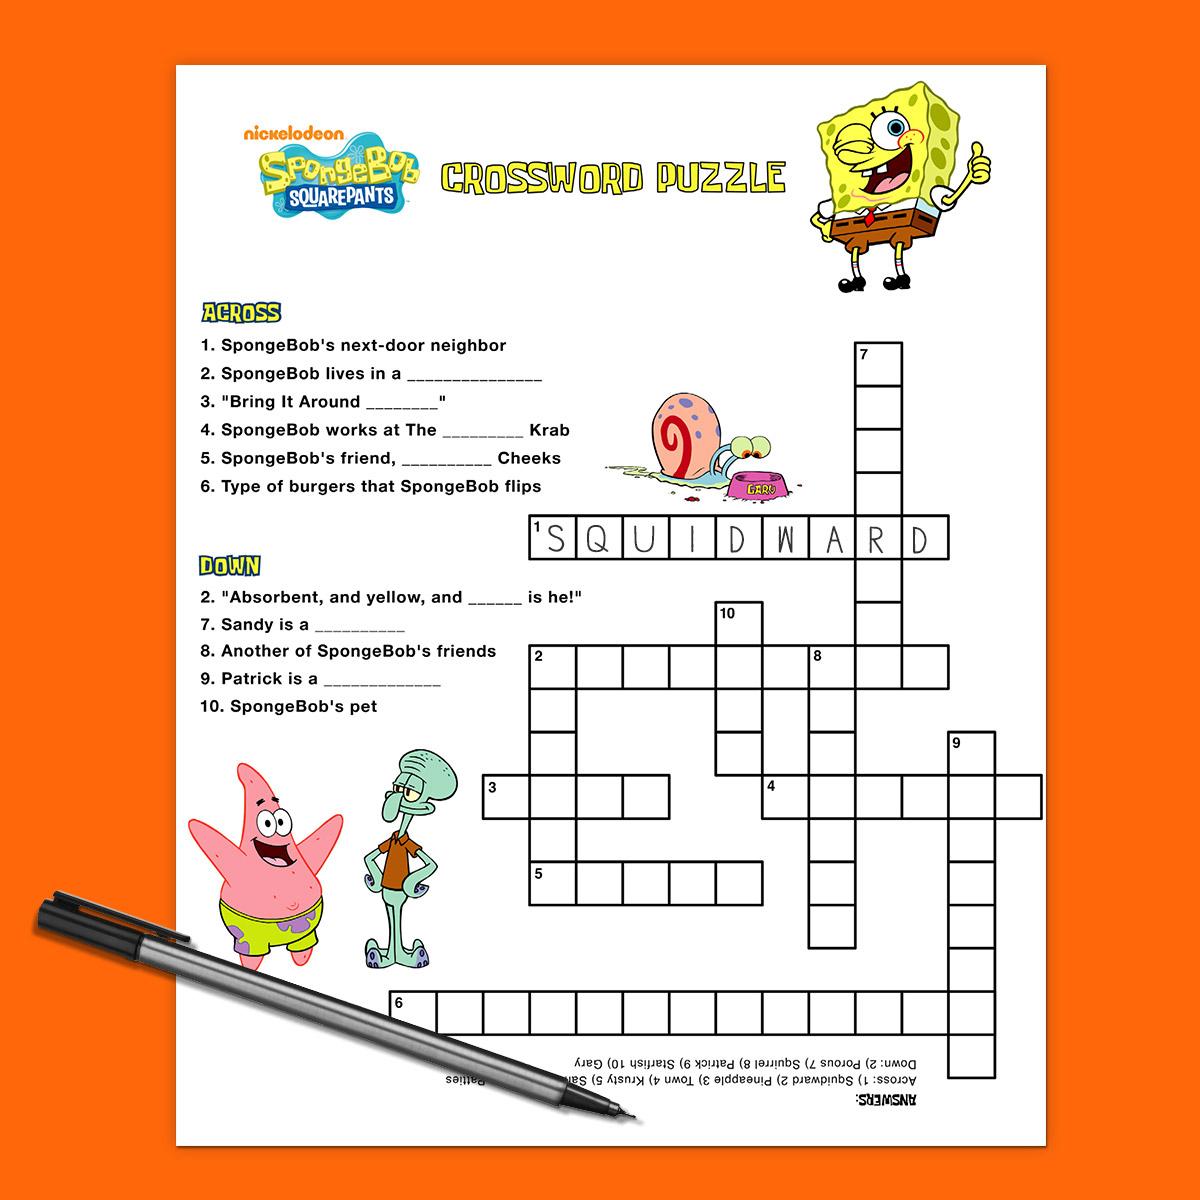 Spongebob Crossword Puzzle | Nickelodeon Parents - Printable Crossword Puzzles Unblocked